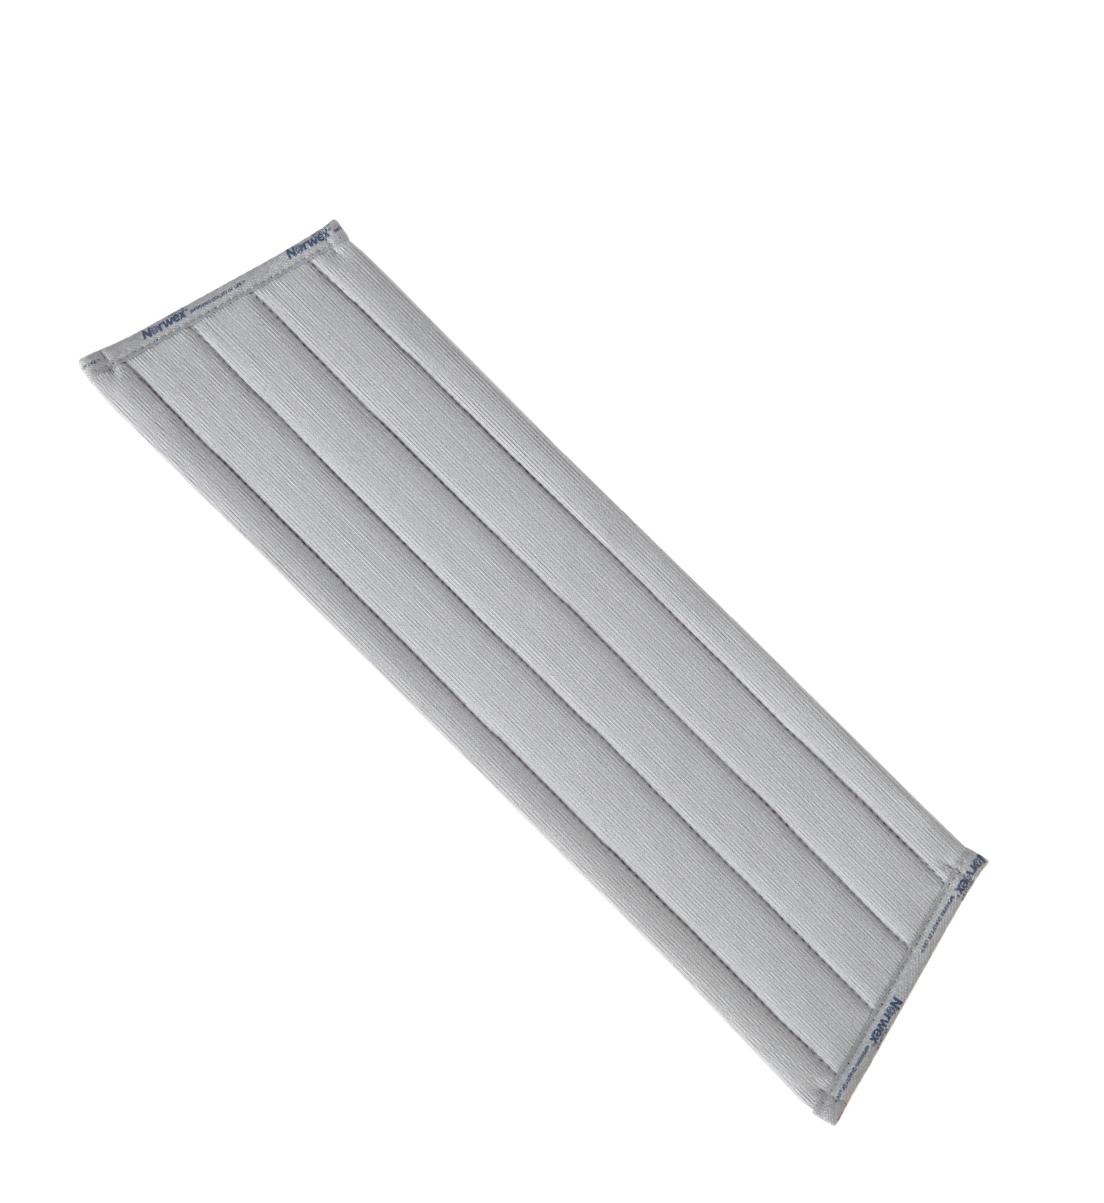 Window Cloth Mop Pad, graphite